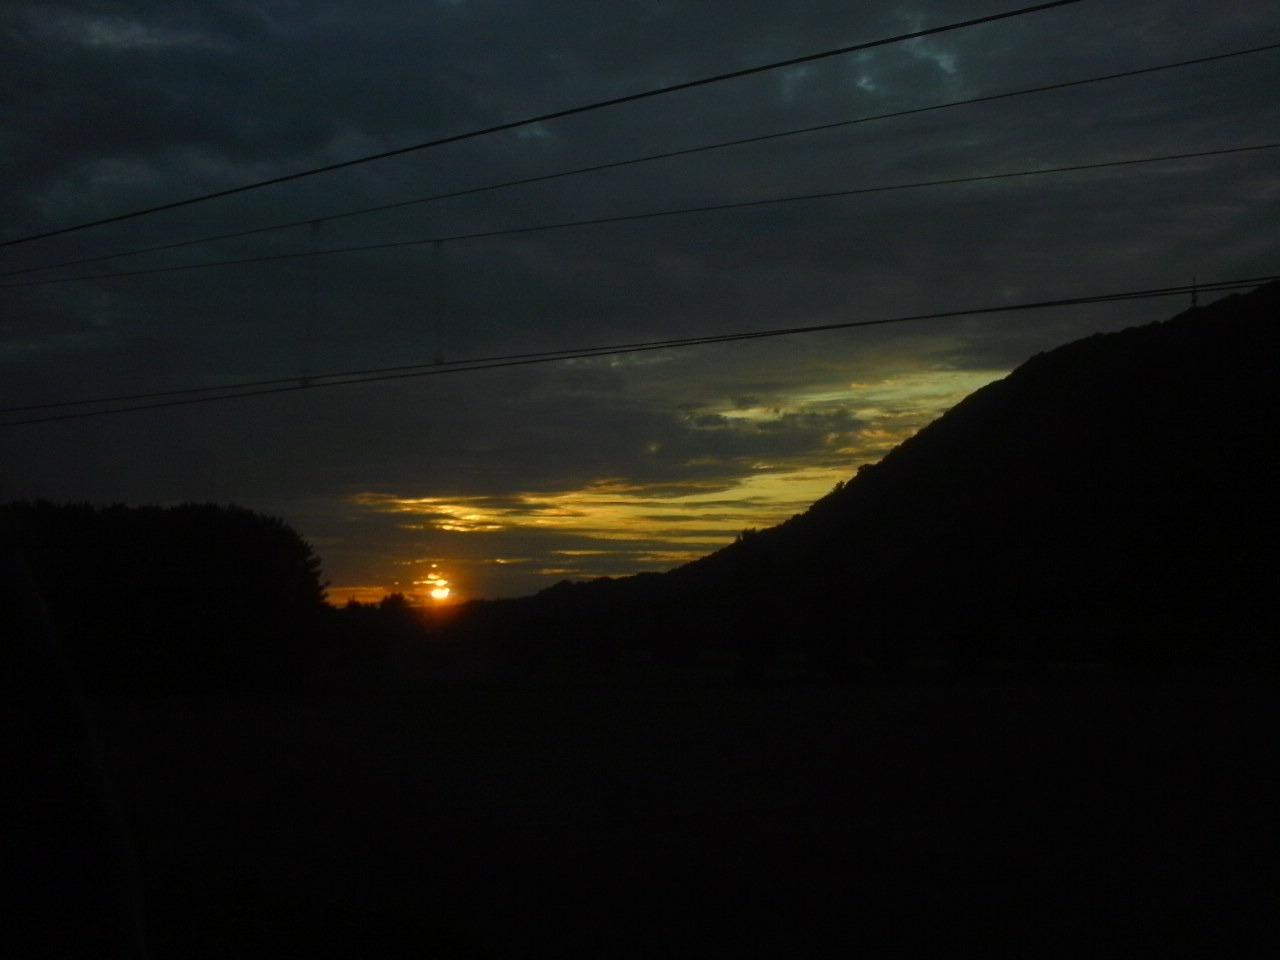 Sonnenuntergang beim Porta Westfalica